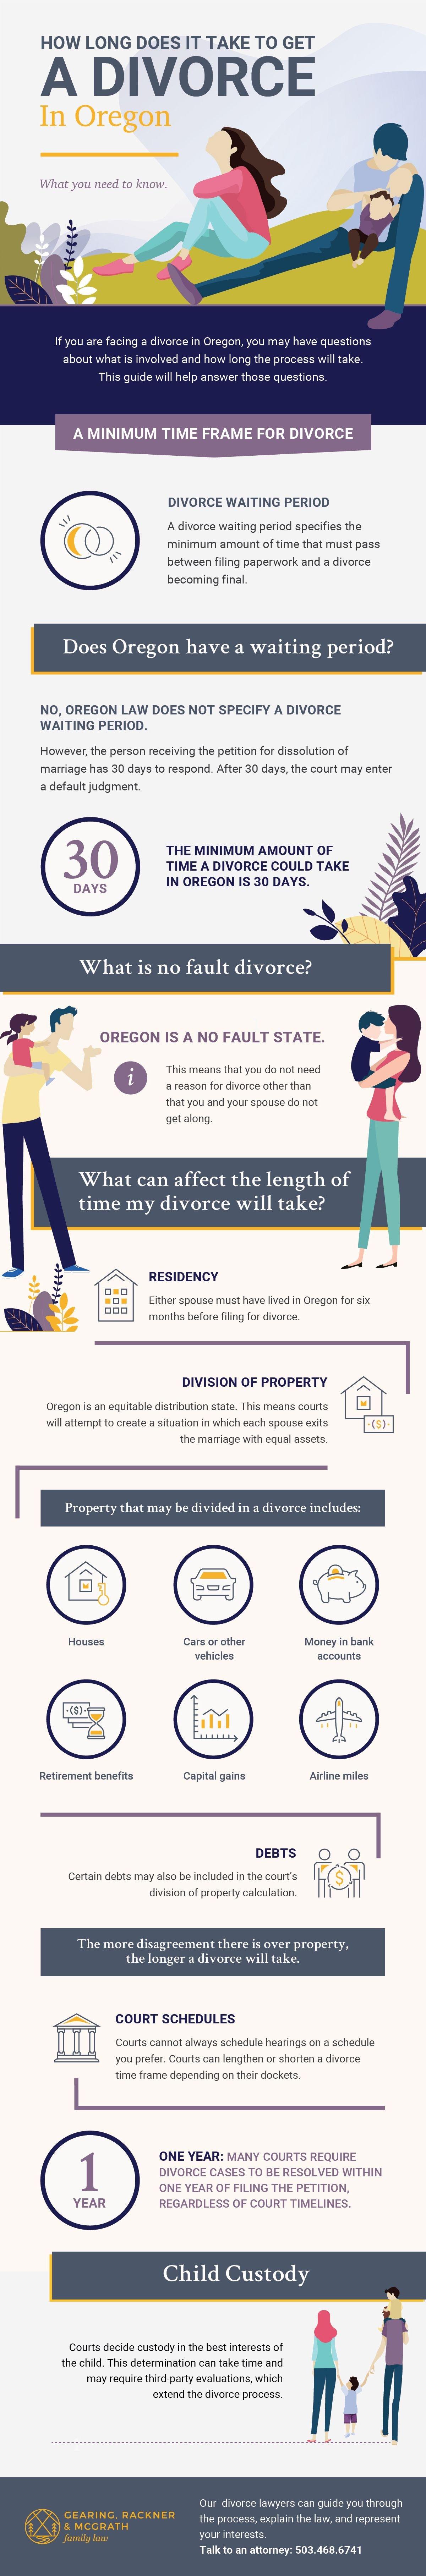 divorce_infographic-c.jpg